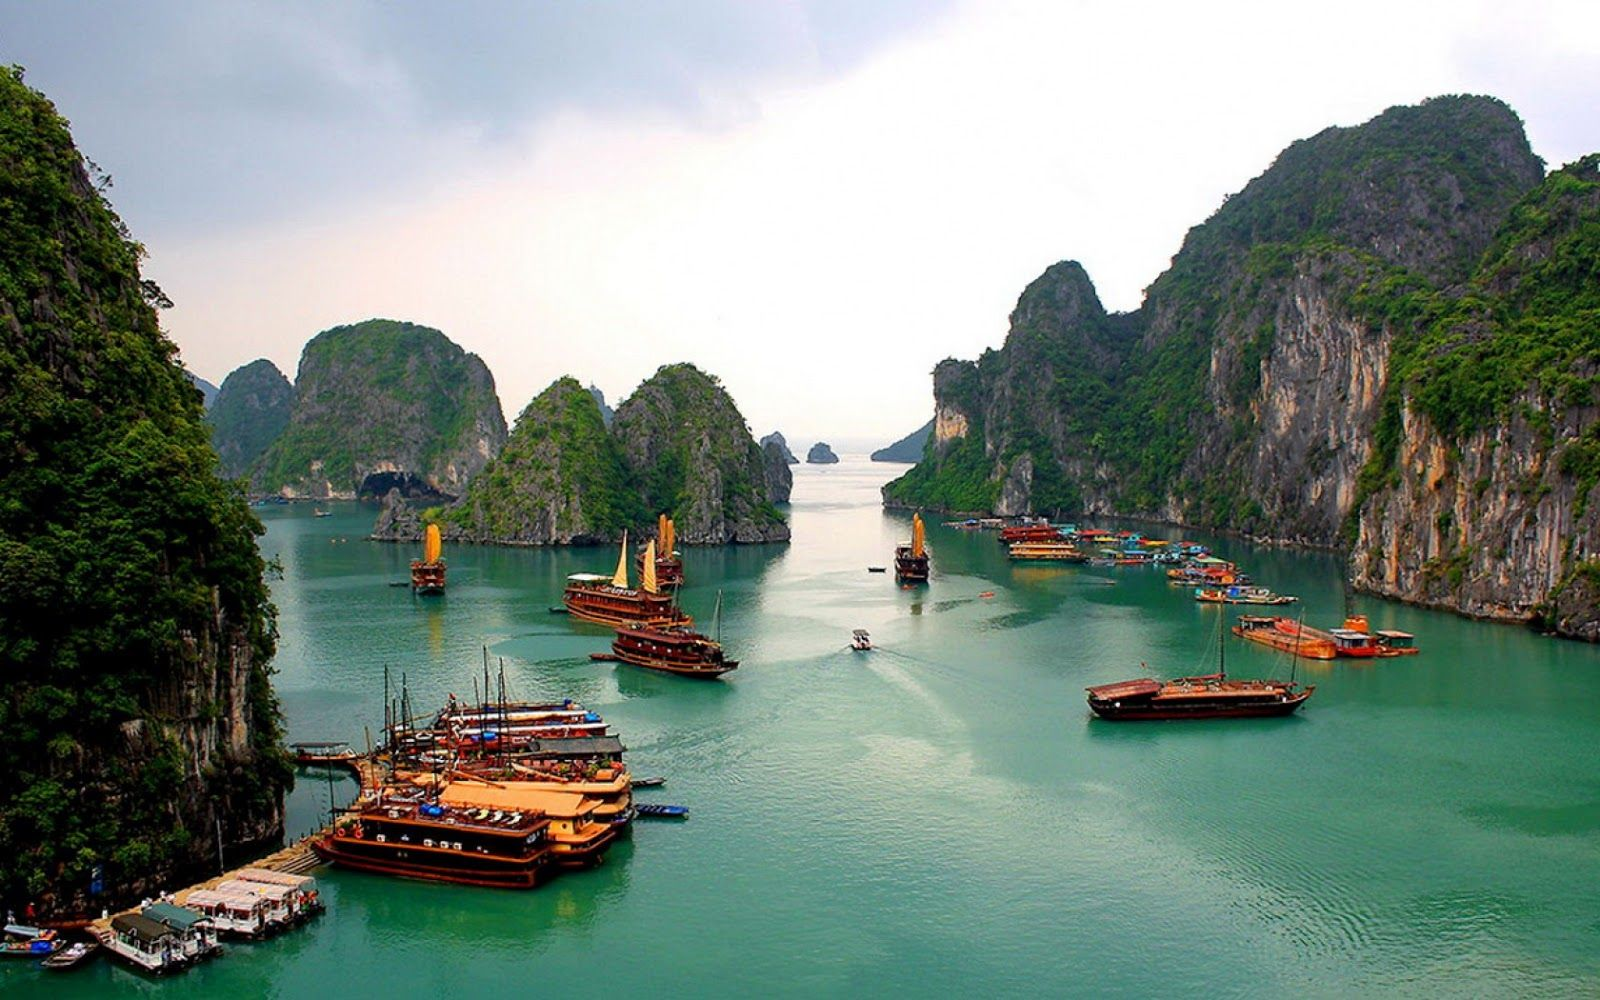 Vịnh Hạ Long Ha Long Bay Day Tours Tours Visit Vietnam